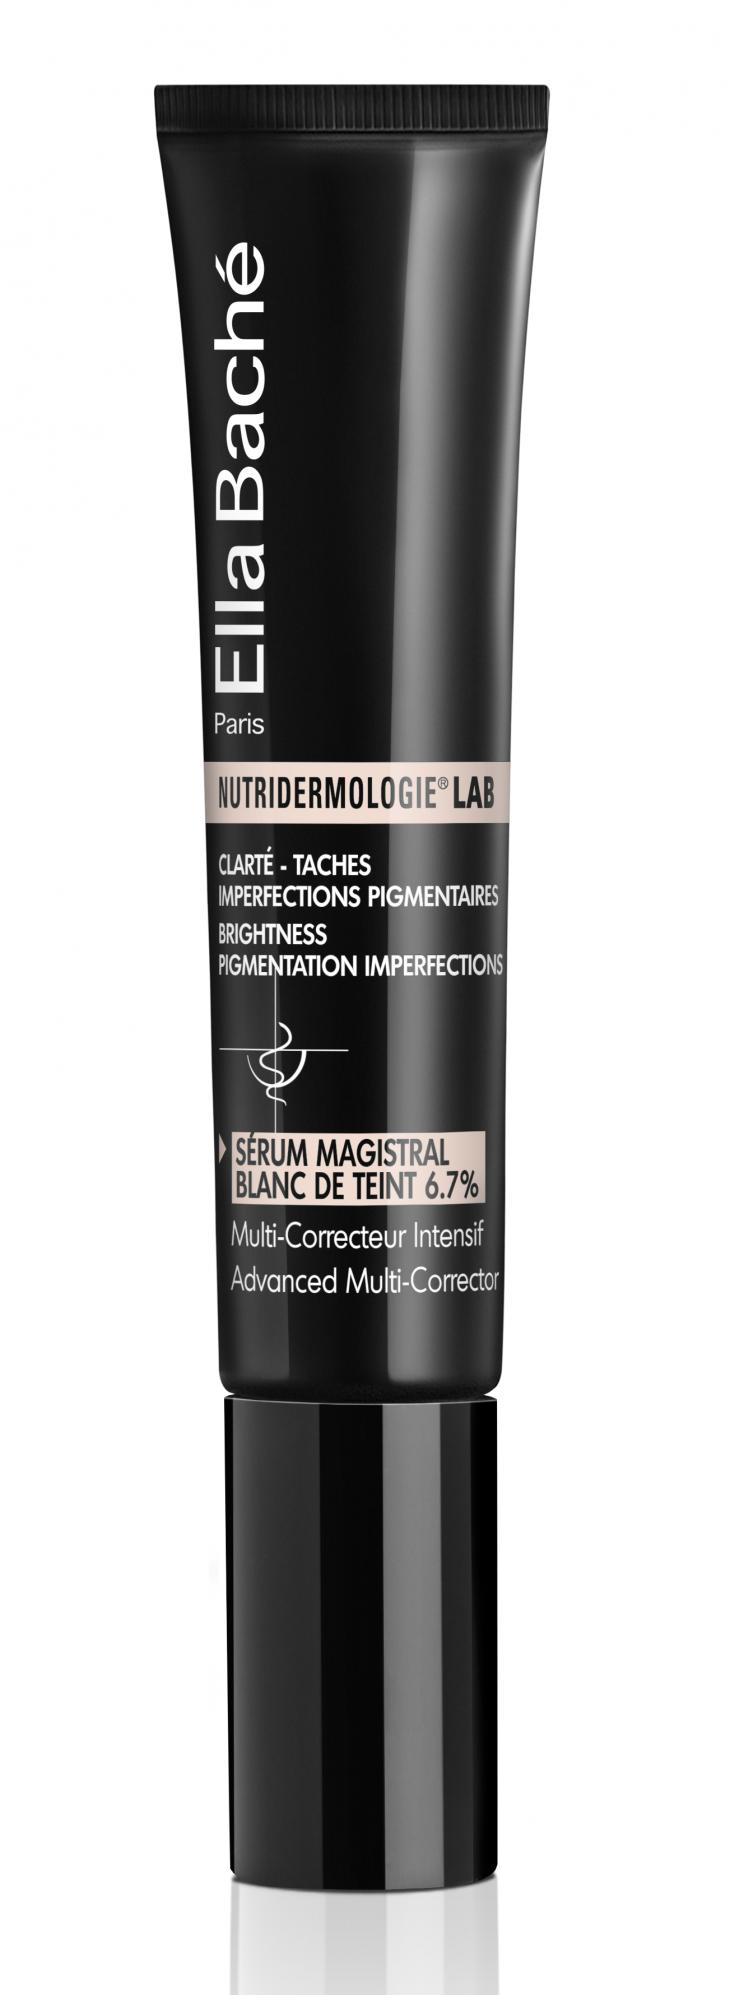 Сыворотка Magistral Blanc de Teint 6,7% для предотвращения и лечения пигментации от Ella Bache